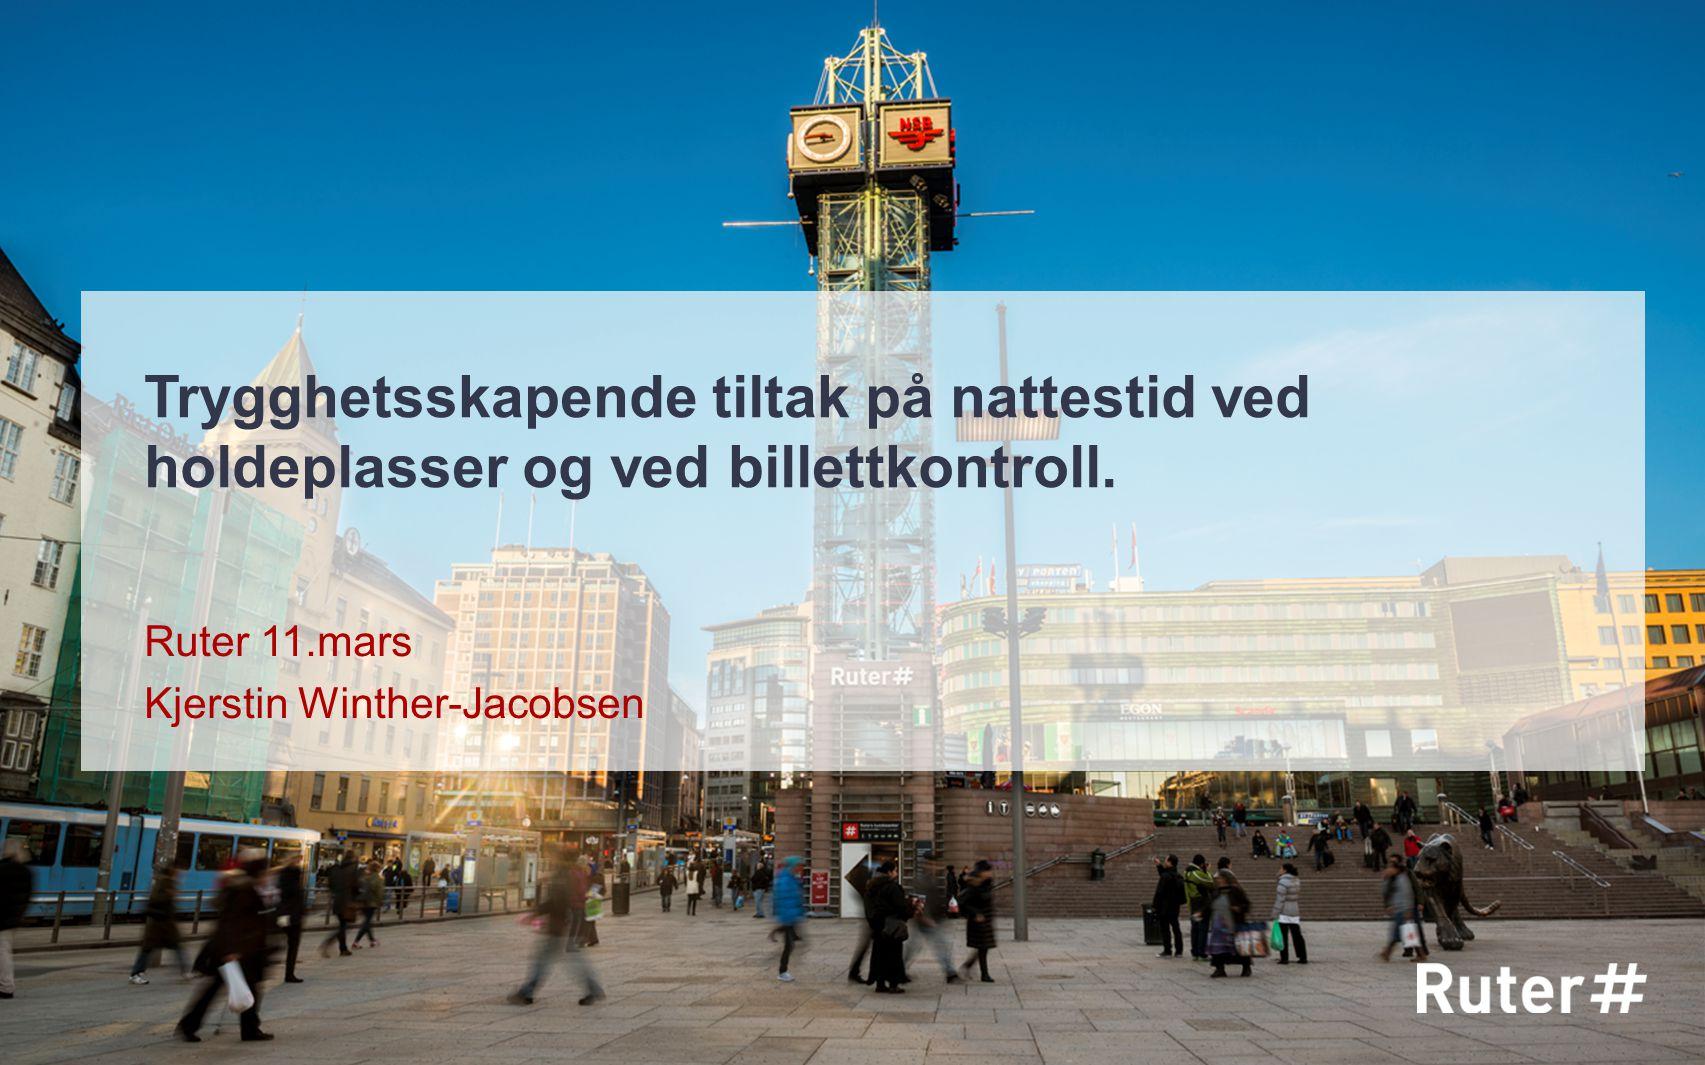 Ruter 11.mars Kjerstin Winther-Jacobsen